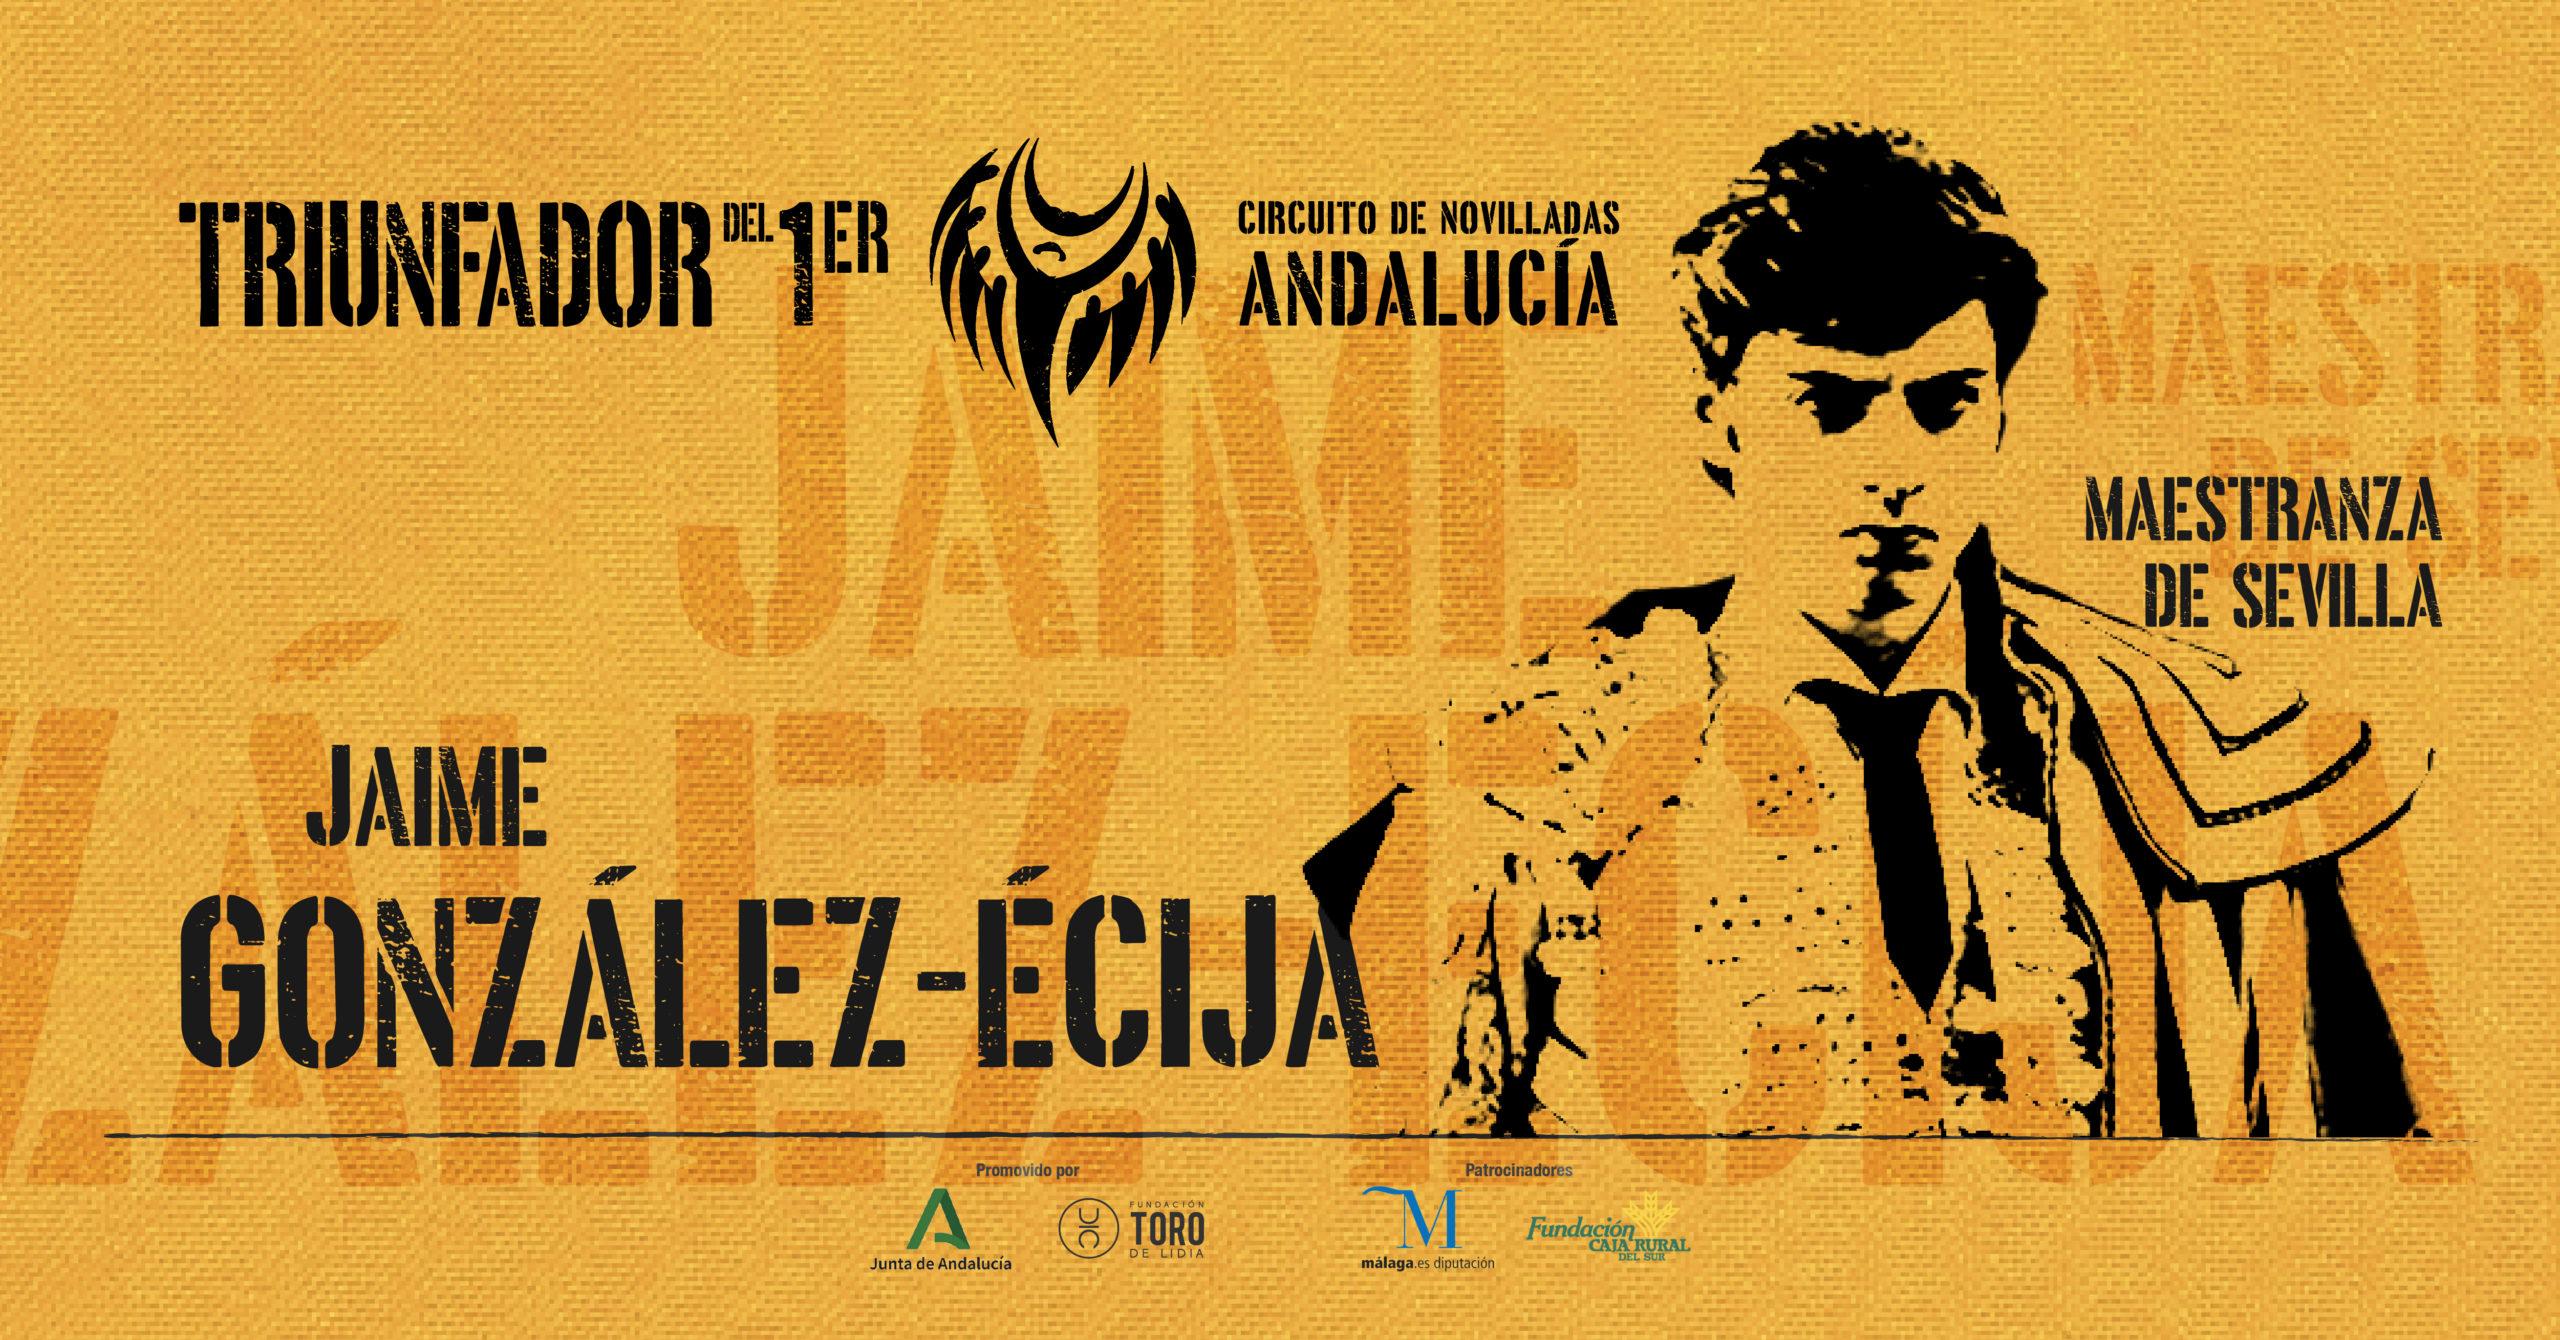 Jaime González-Écija, novillero triunfador de Andalucía 2020